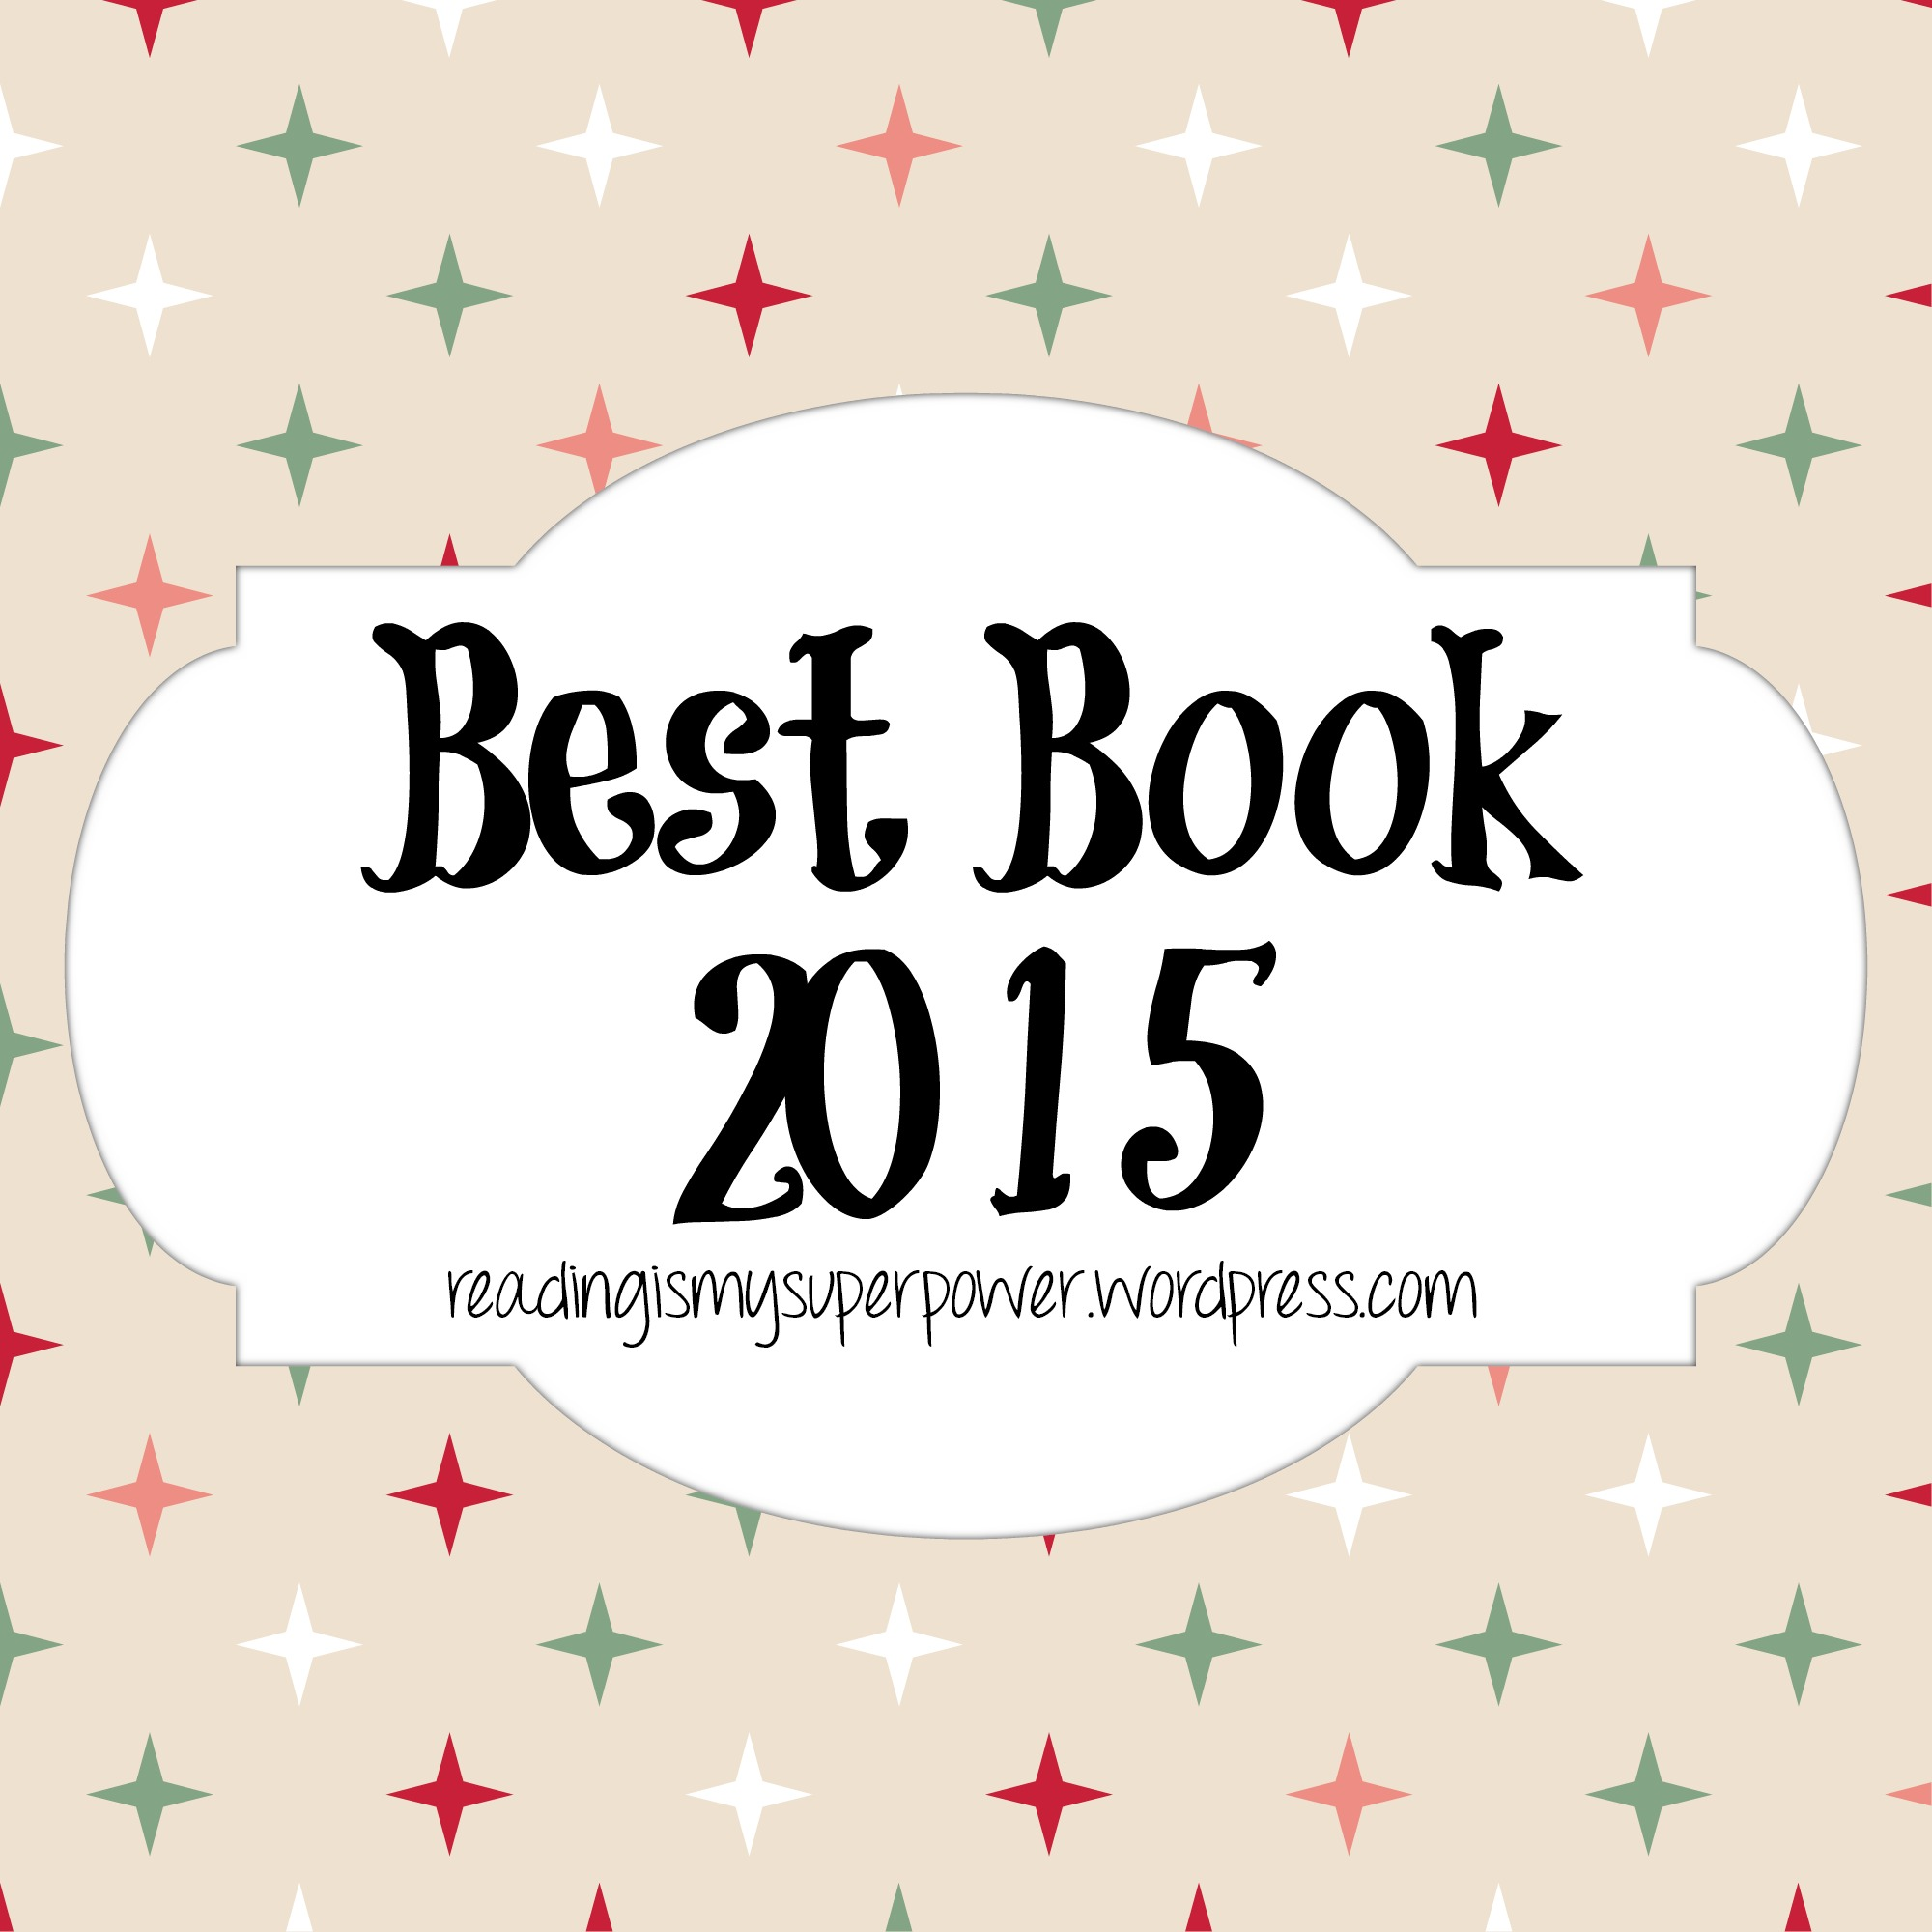 best book 2015